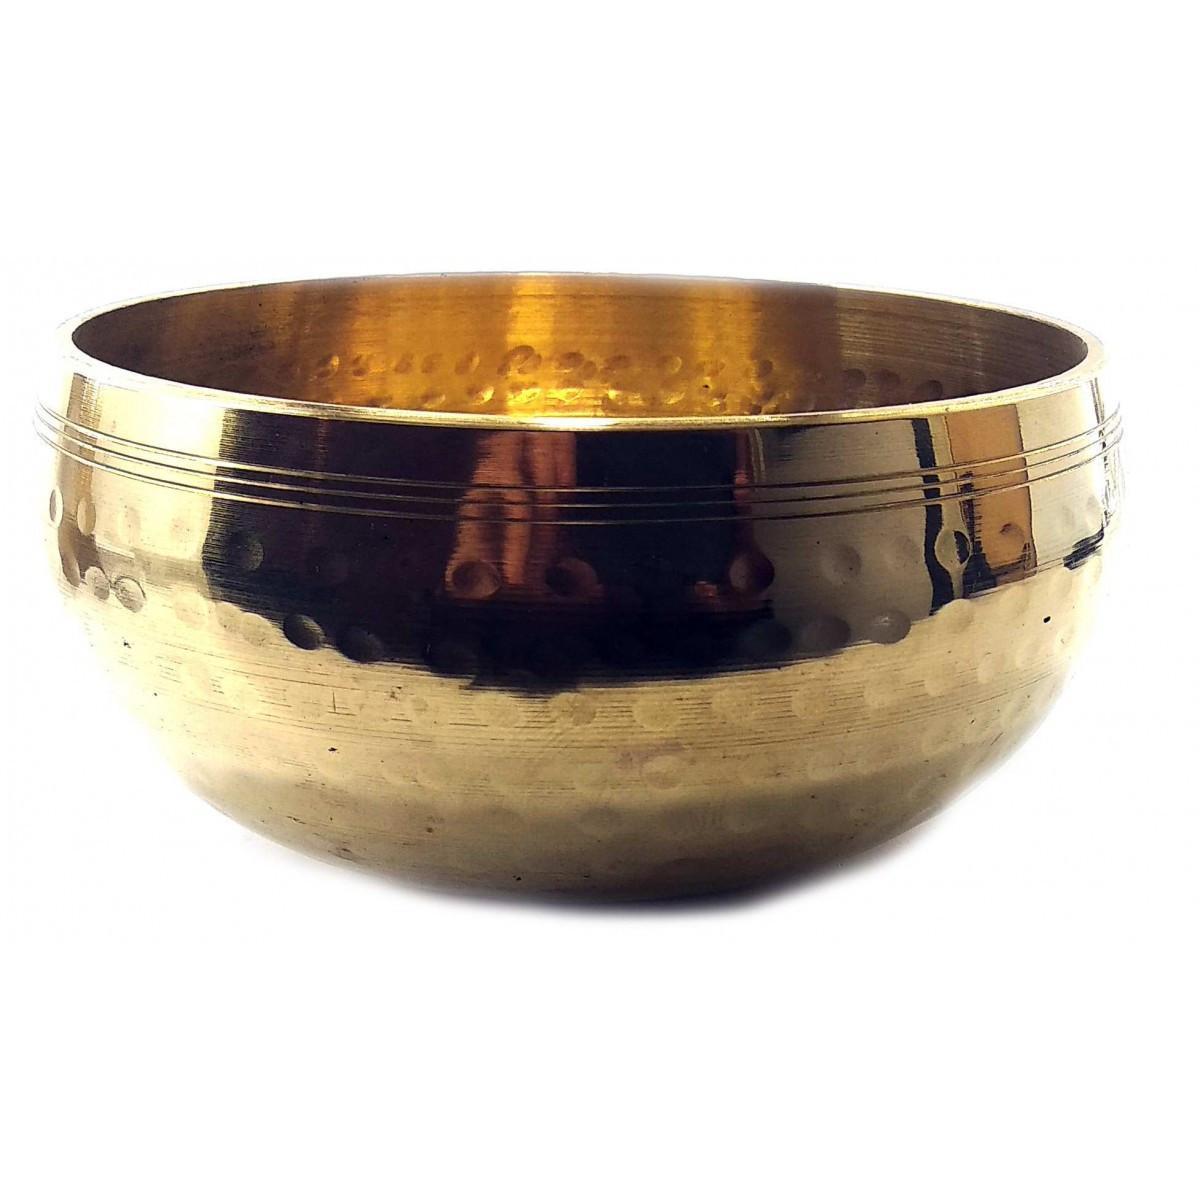 Чаша поющая кованая ручная работа (d-15,5 см h-8 см)(925 г.)